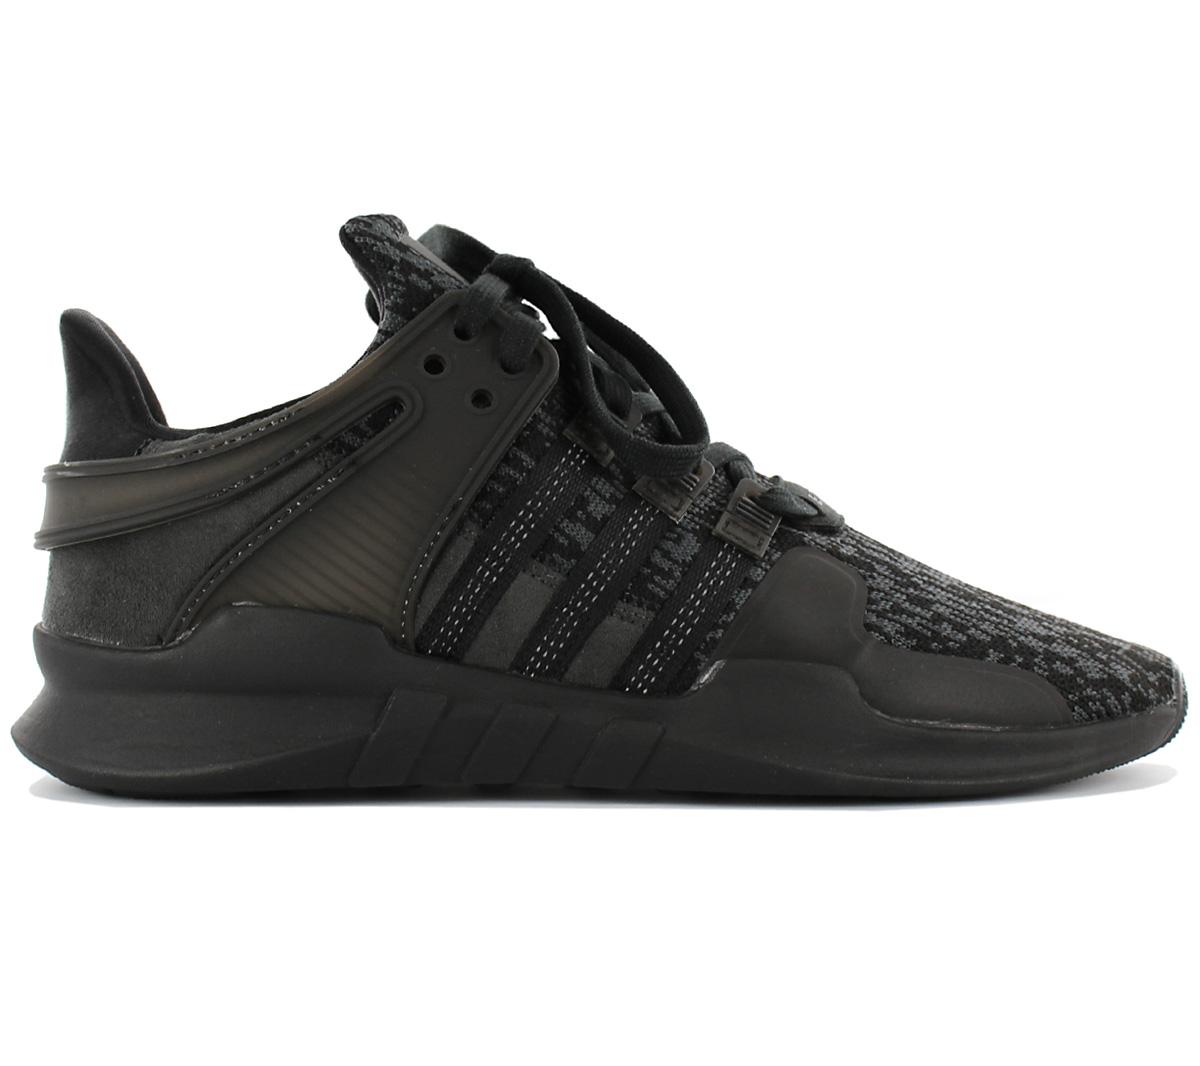 Adidas Equipment Originals EQT Equipment Adidas Support ADV 91/16 Herren Sneaker Schuhe Turnschuh e56715